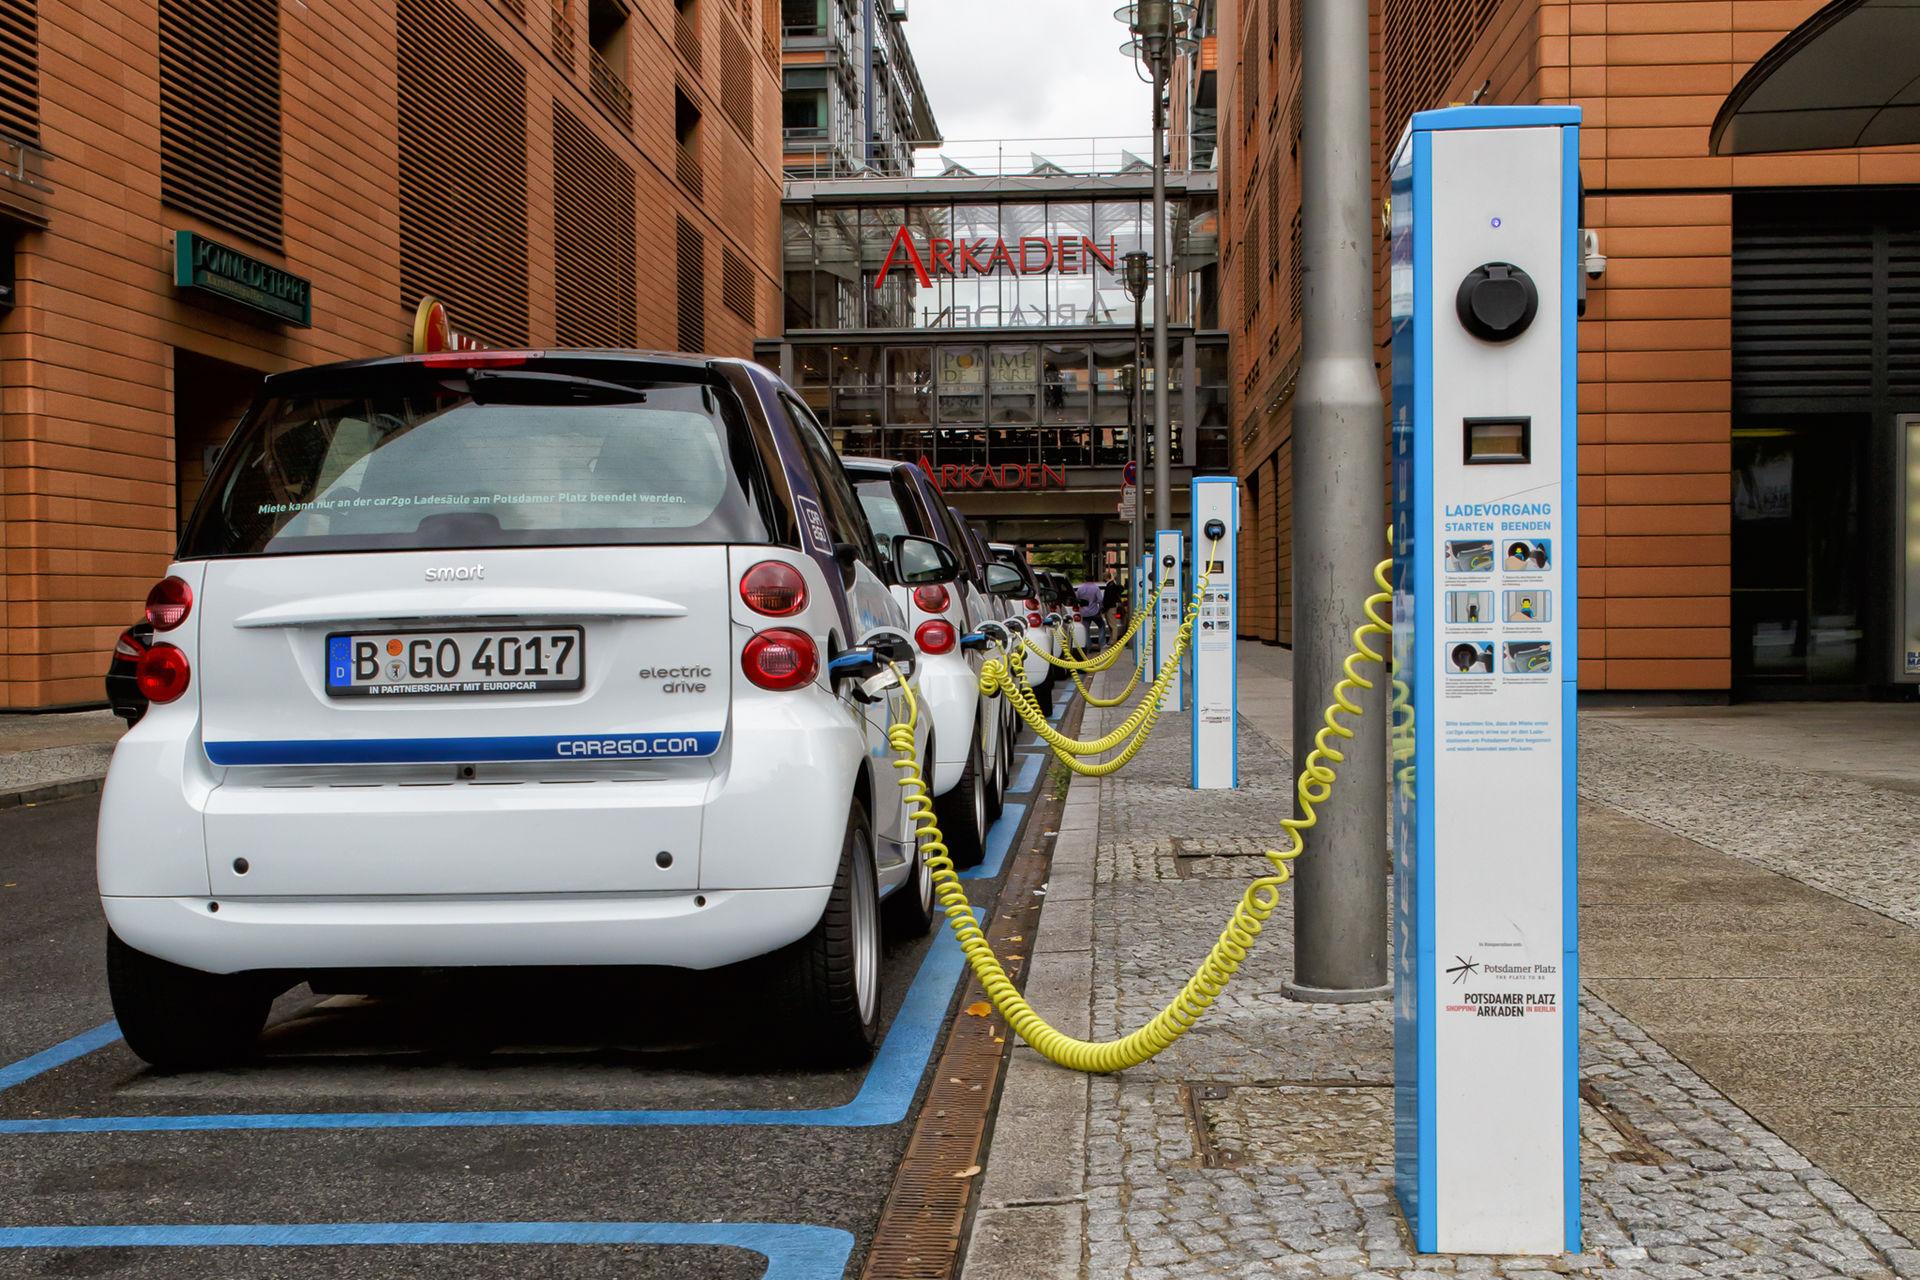 holland-ponders-banning-gas-burning-car-sales-starting-2025-106078_1